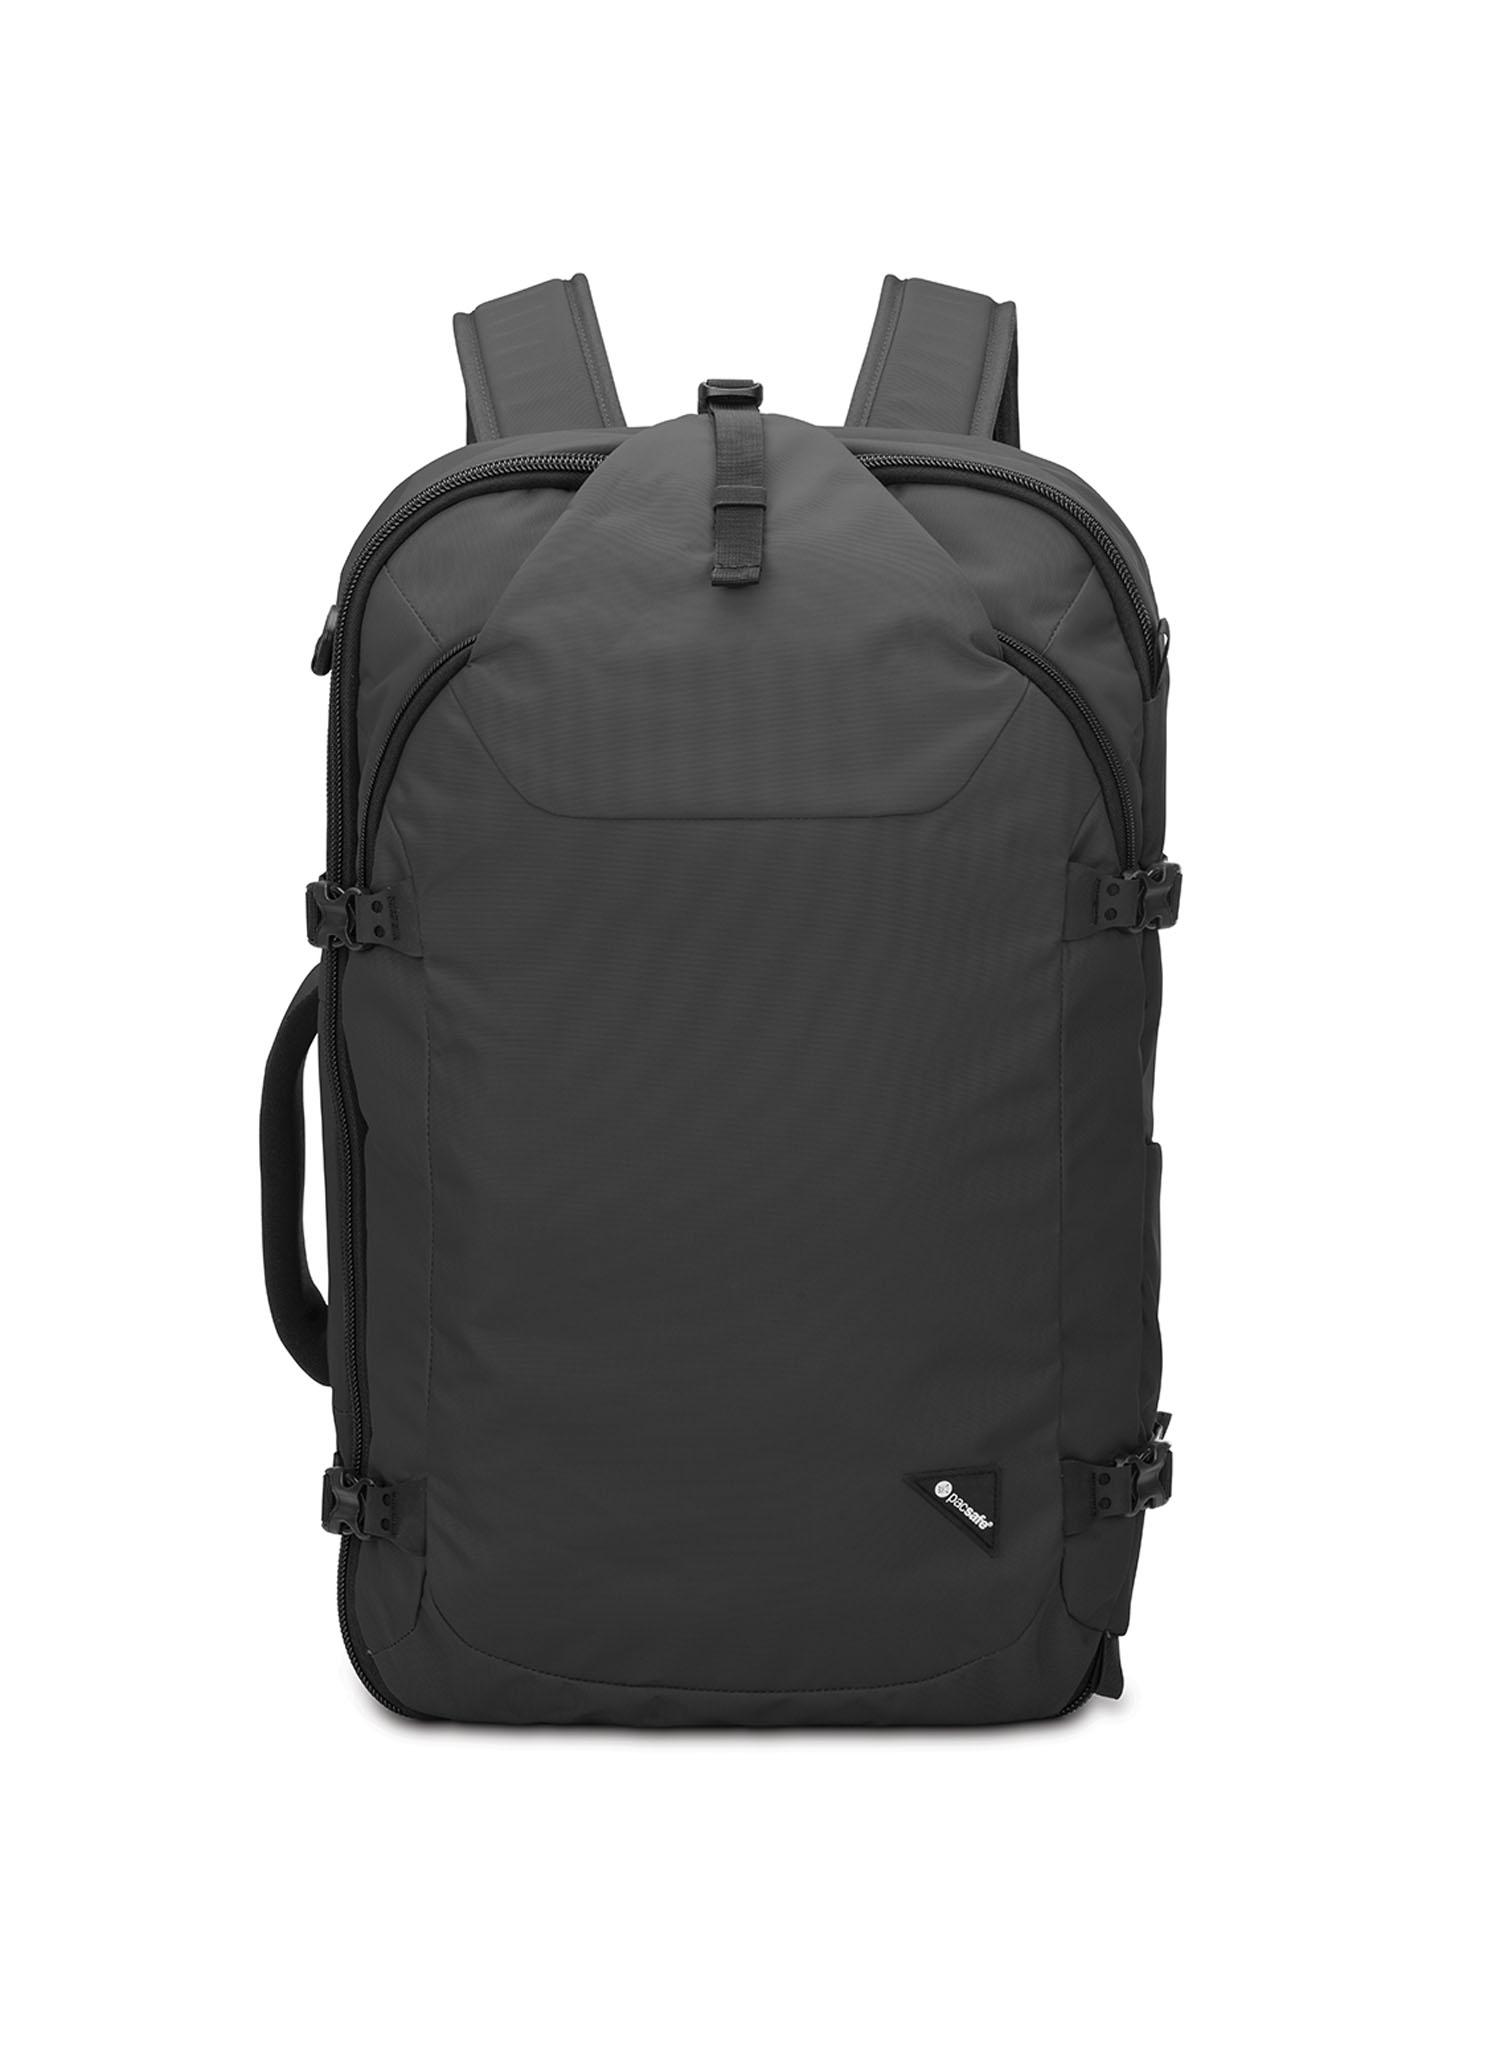 211d14b4cc6c0 pacsafe Venturesafe EXP 45L Rucksack mit RFID-Schutz Black